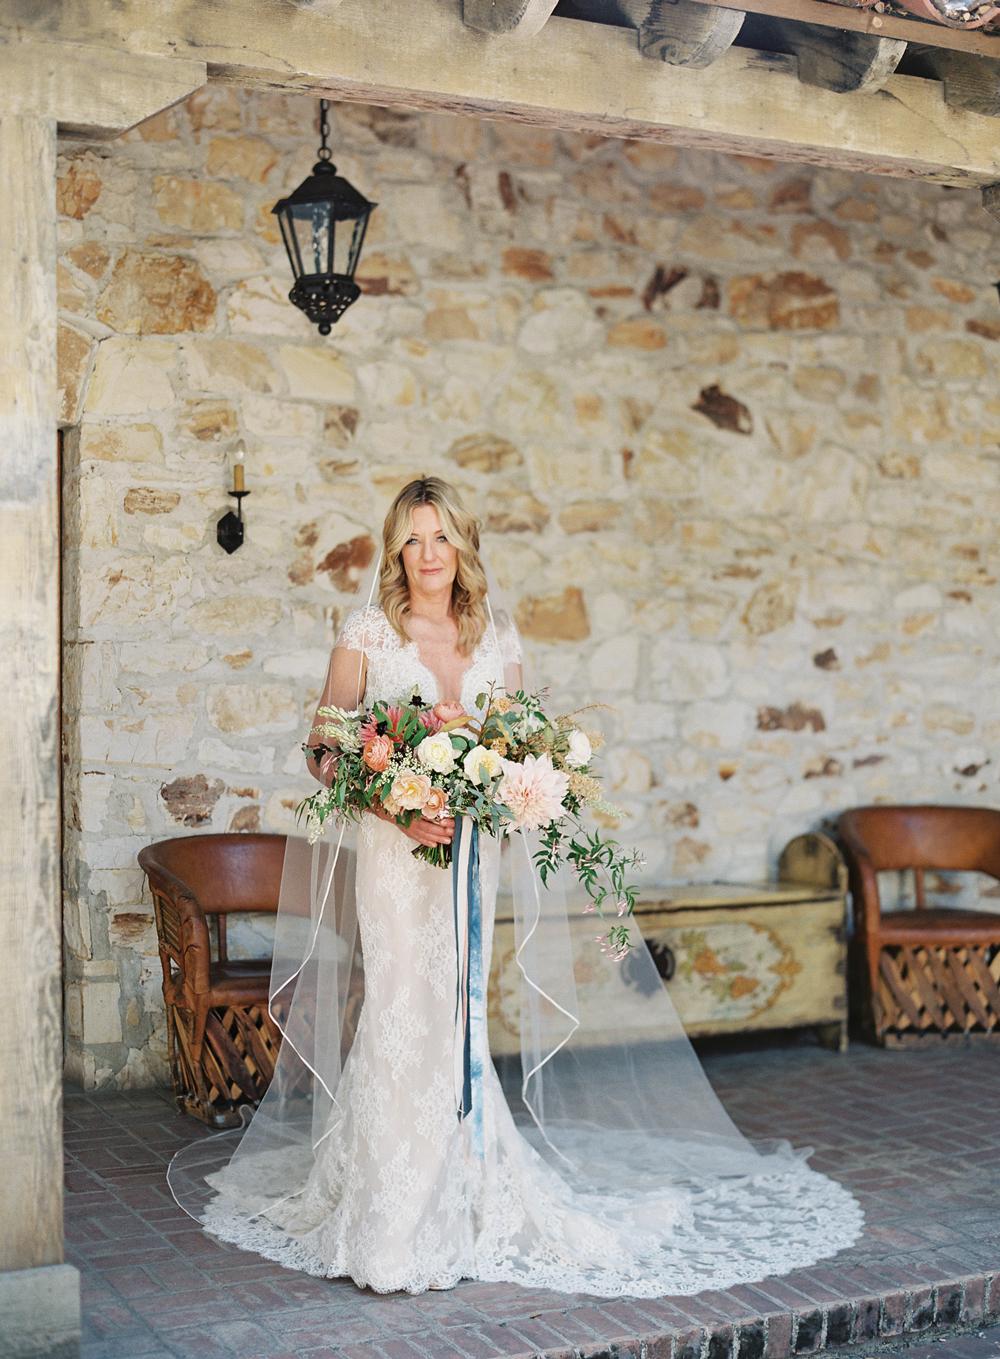 laurie michael wedding bride